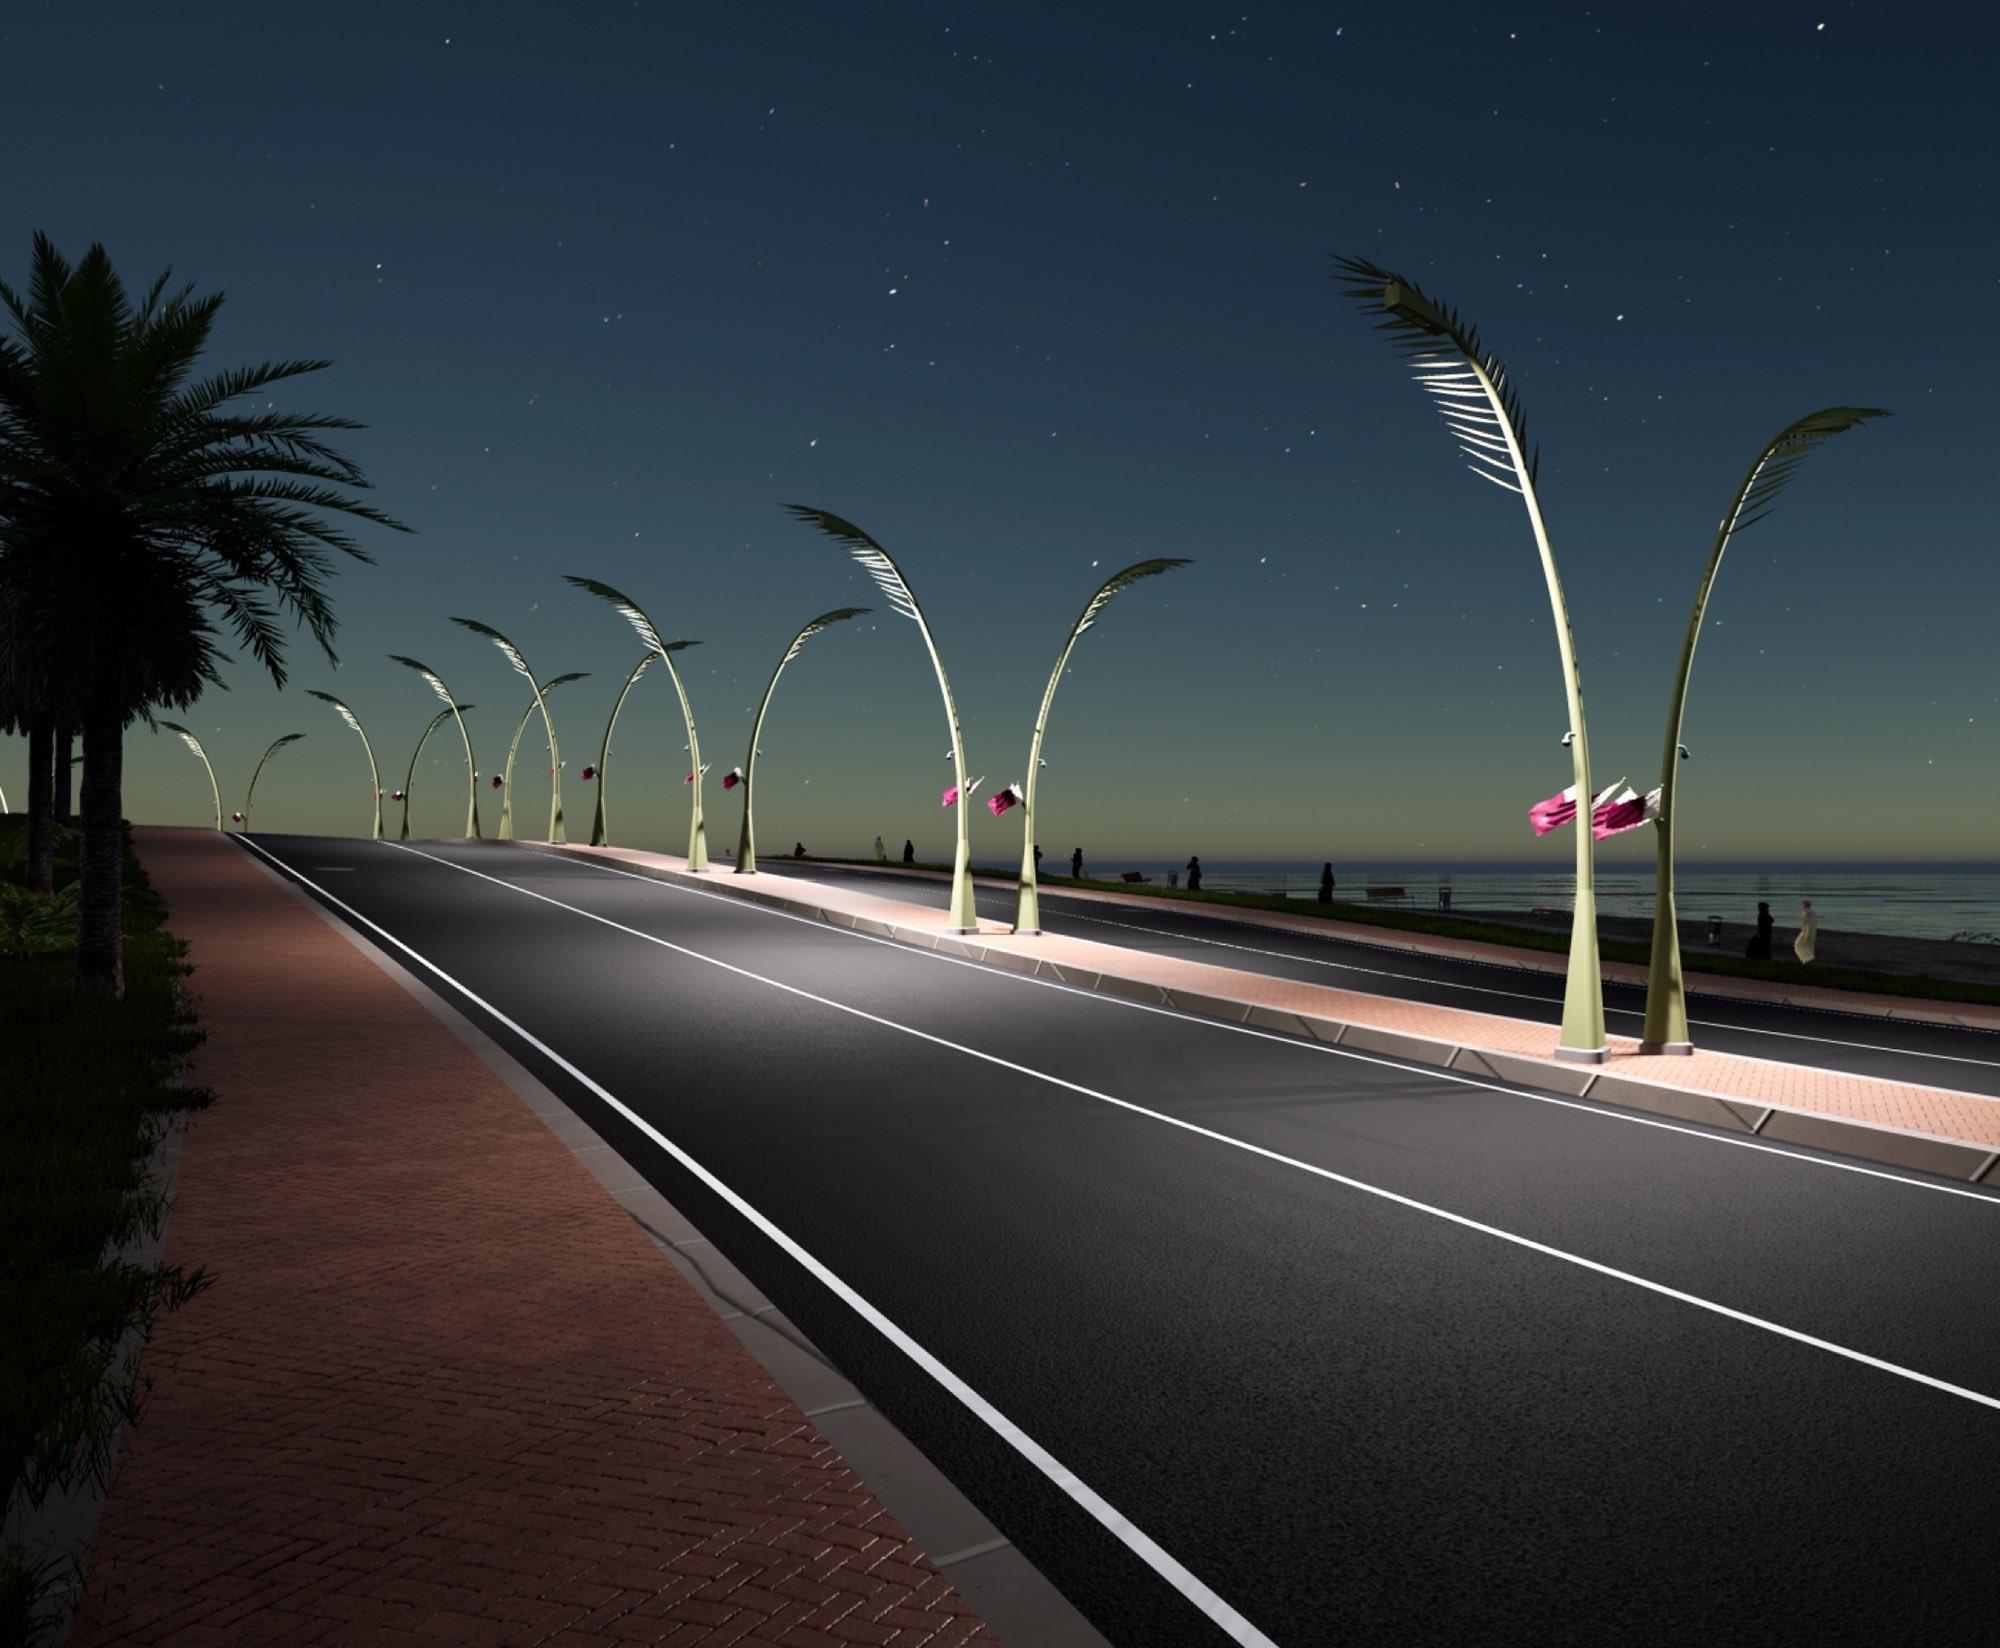 Installation of Decorative Light Poles on Doha Corniche Starts